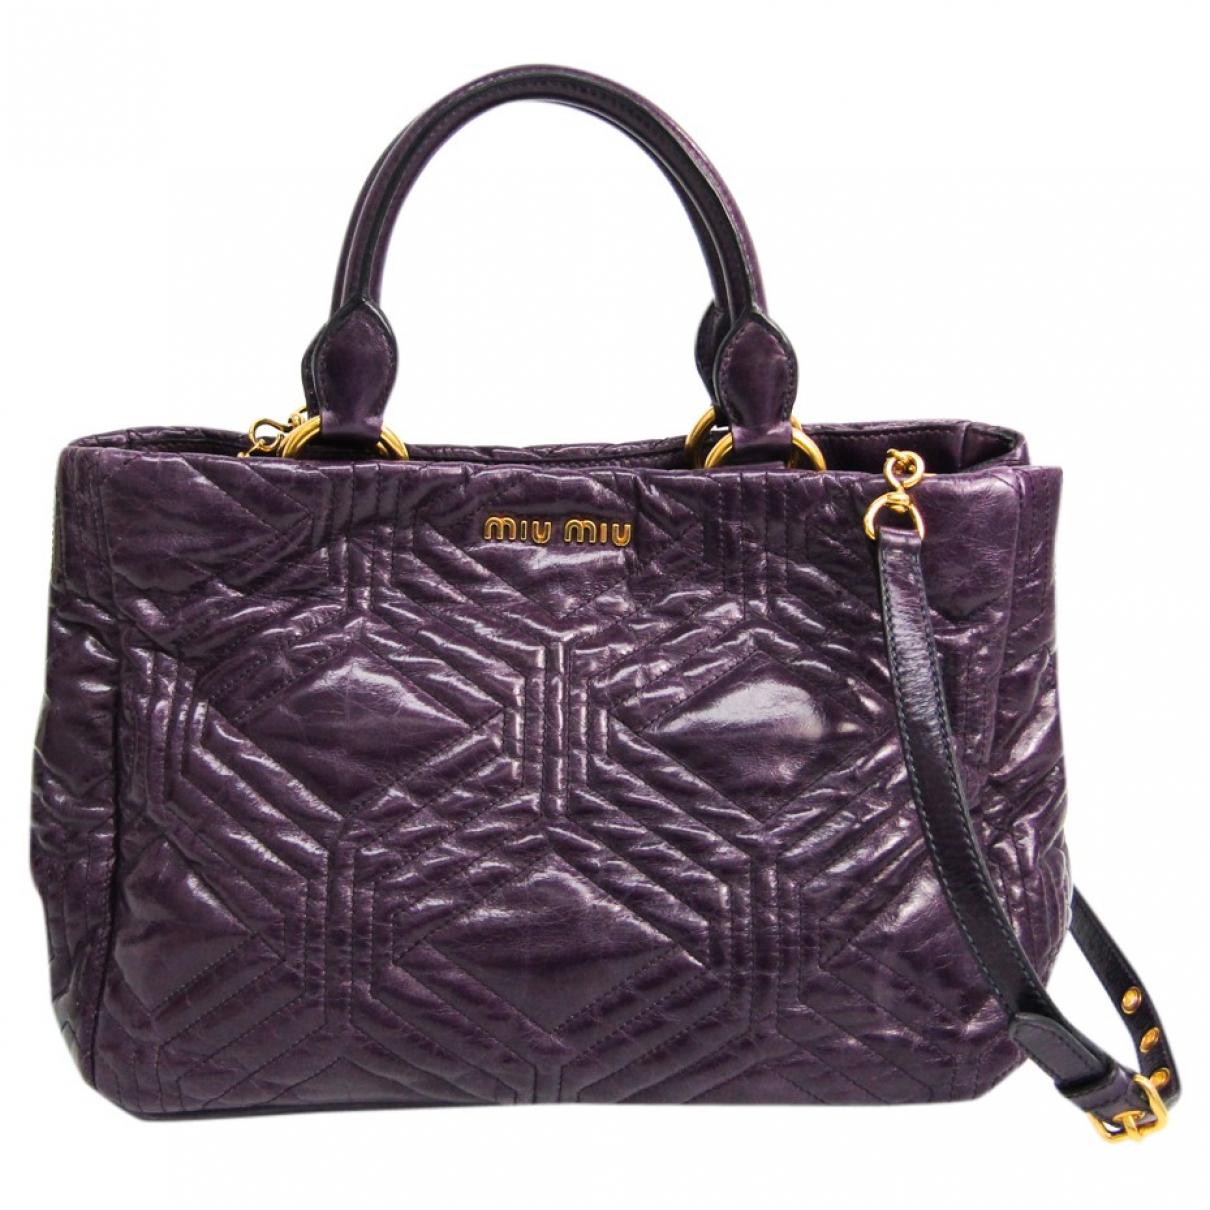 Miu Miu N Purple Leather handbag for Women N